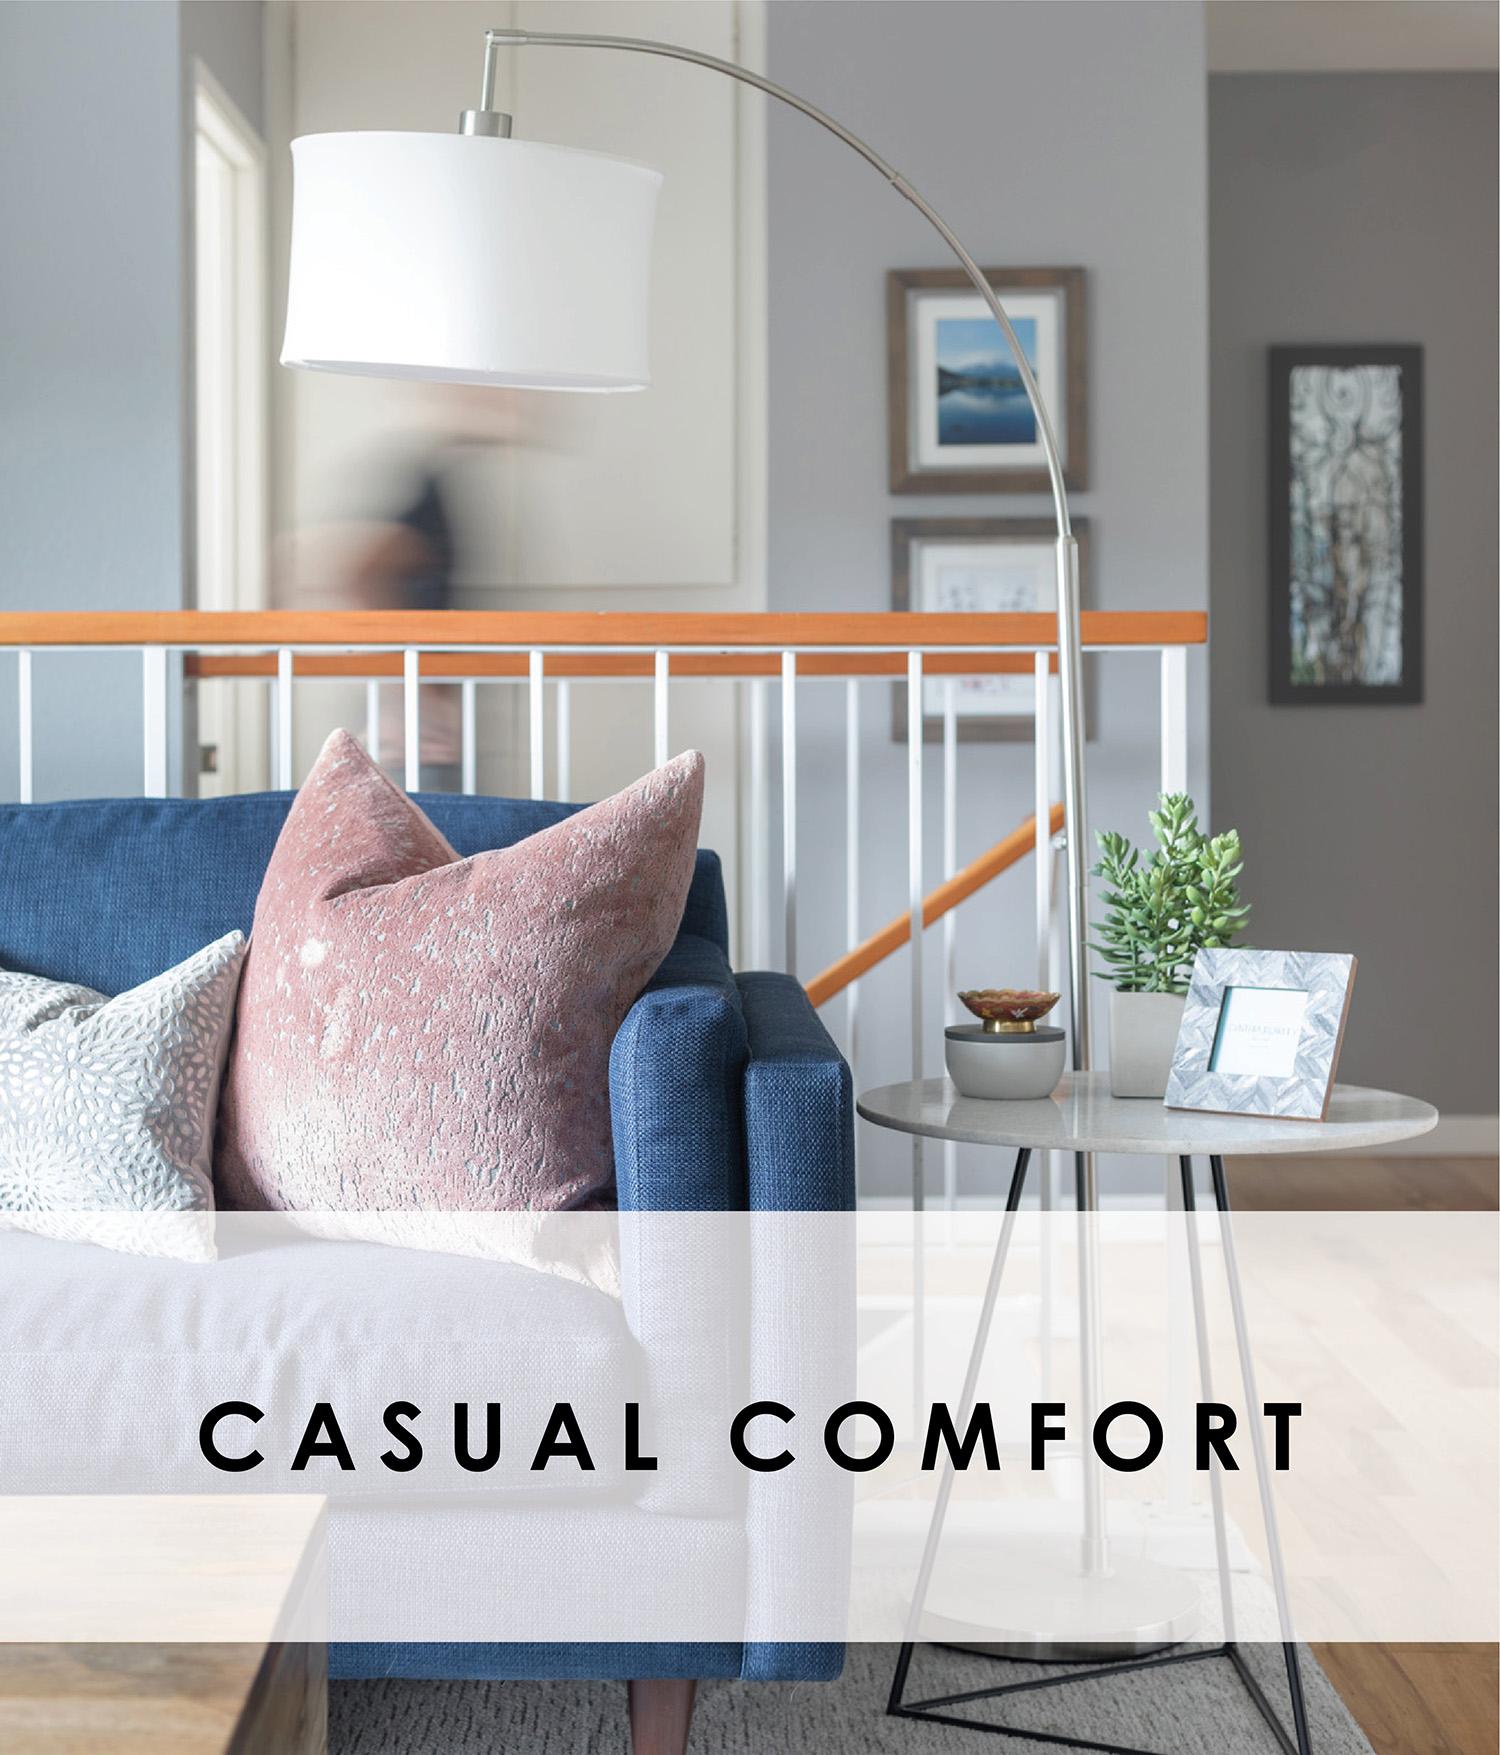 Casual Comfort.jpg